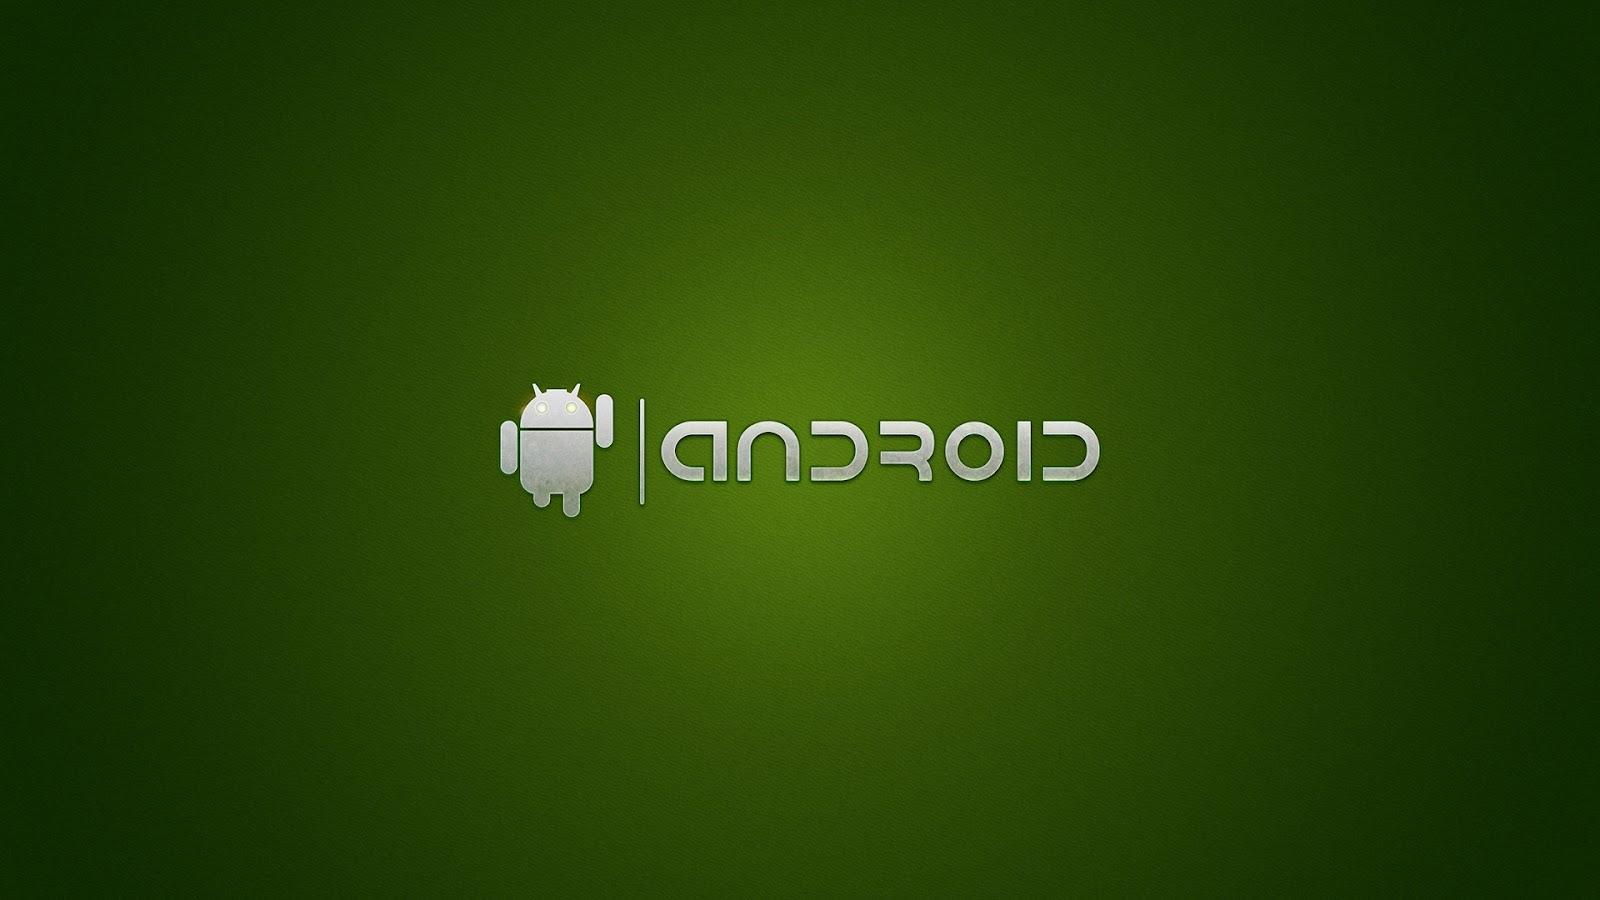 http://2.bp.blogspot.com/-Dzmfvh6b7N0/UAL4SDCCuyI/AAAAAAAAAZg/u-yPB5AzVN4/s1600/hd+wallpapers+for+android-3.jpg